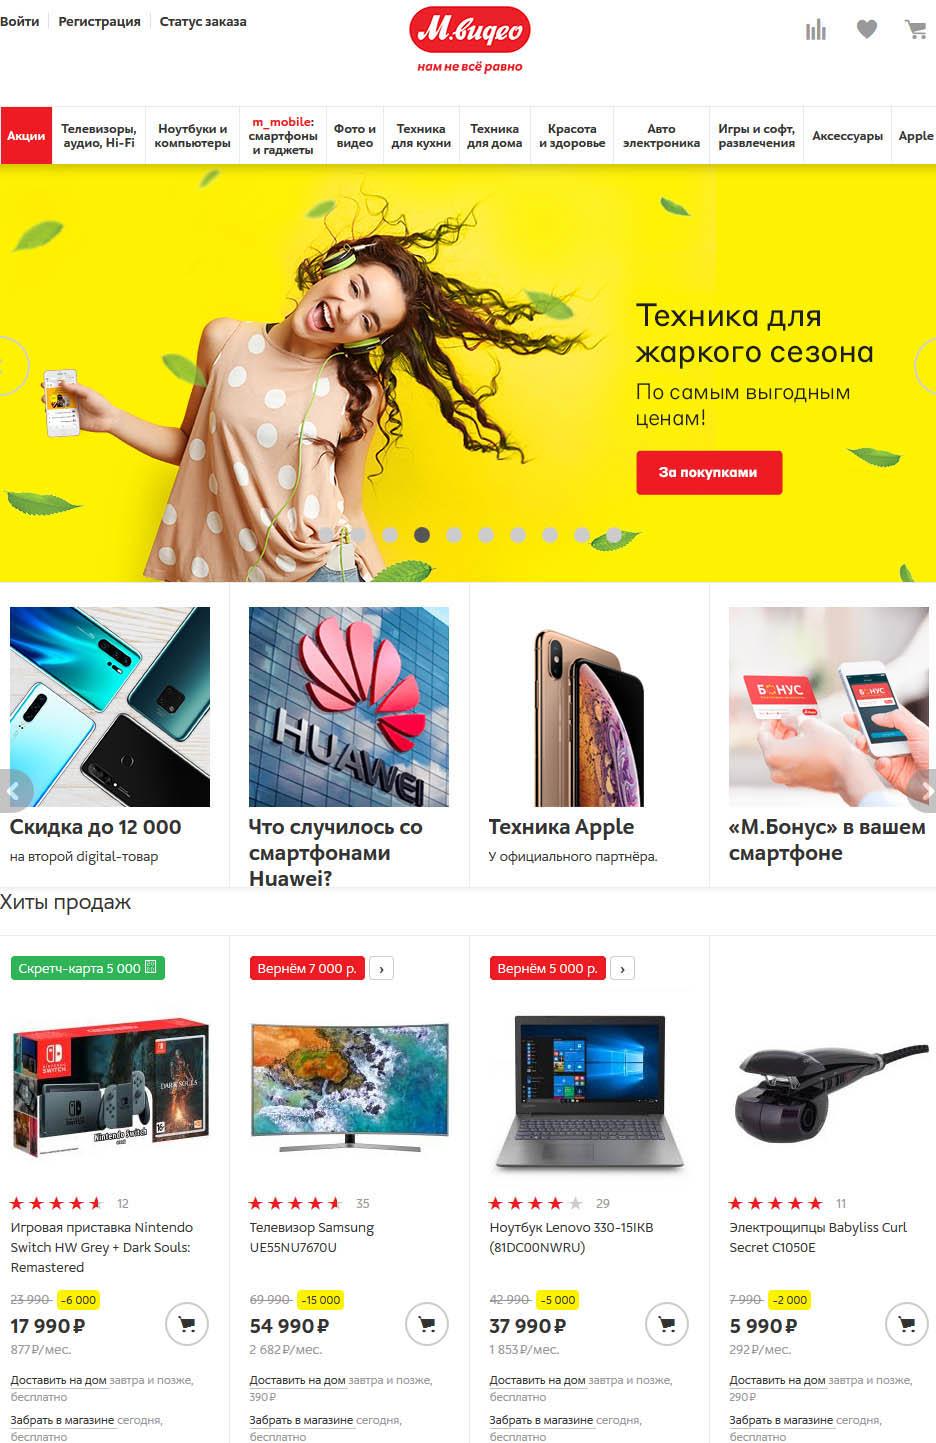 Интернет-магазин М Видео